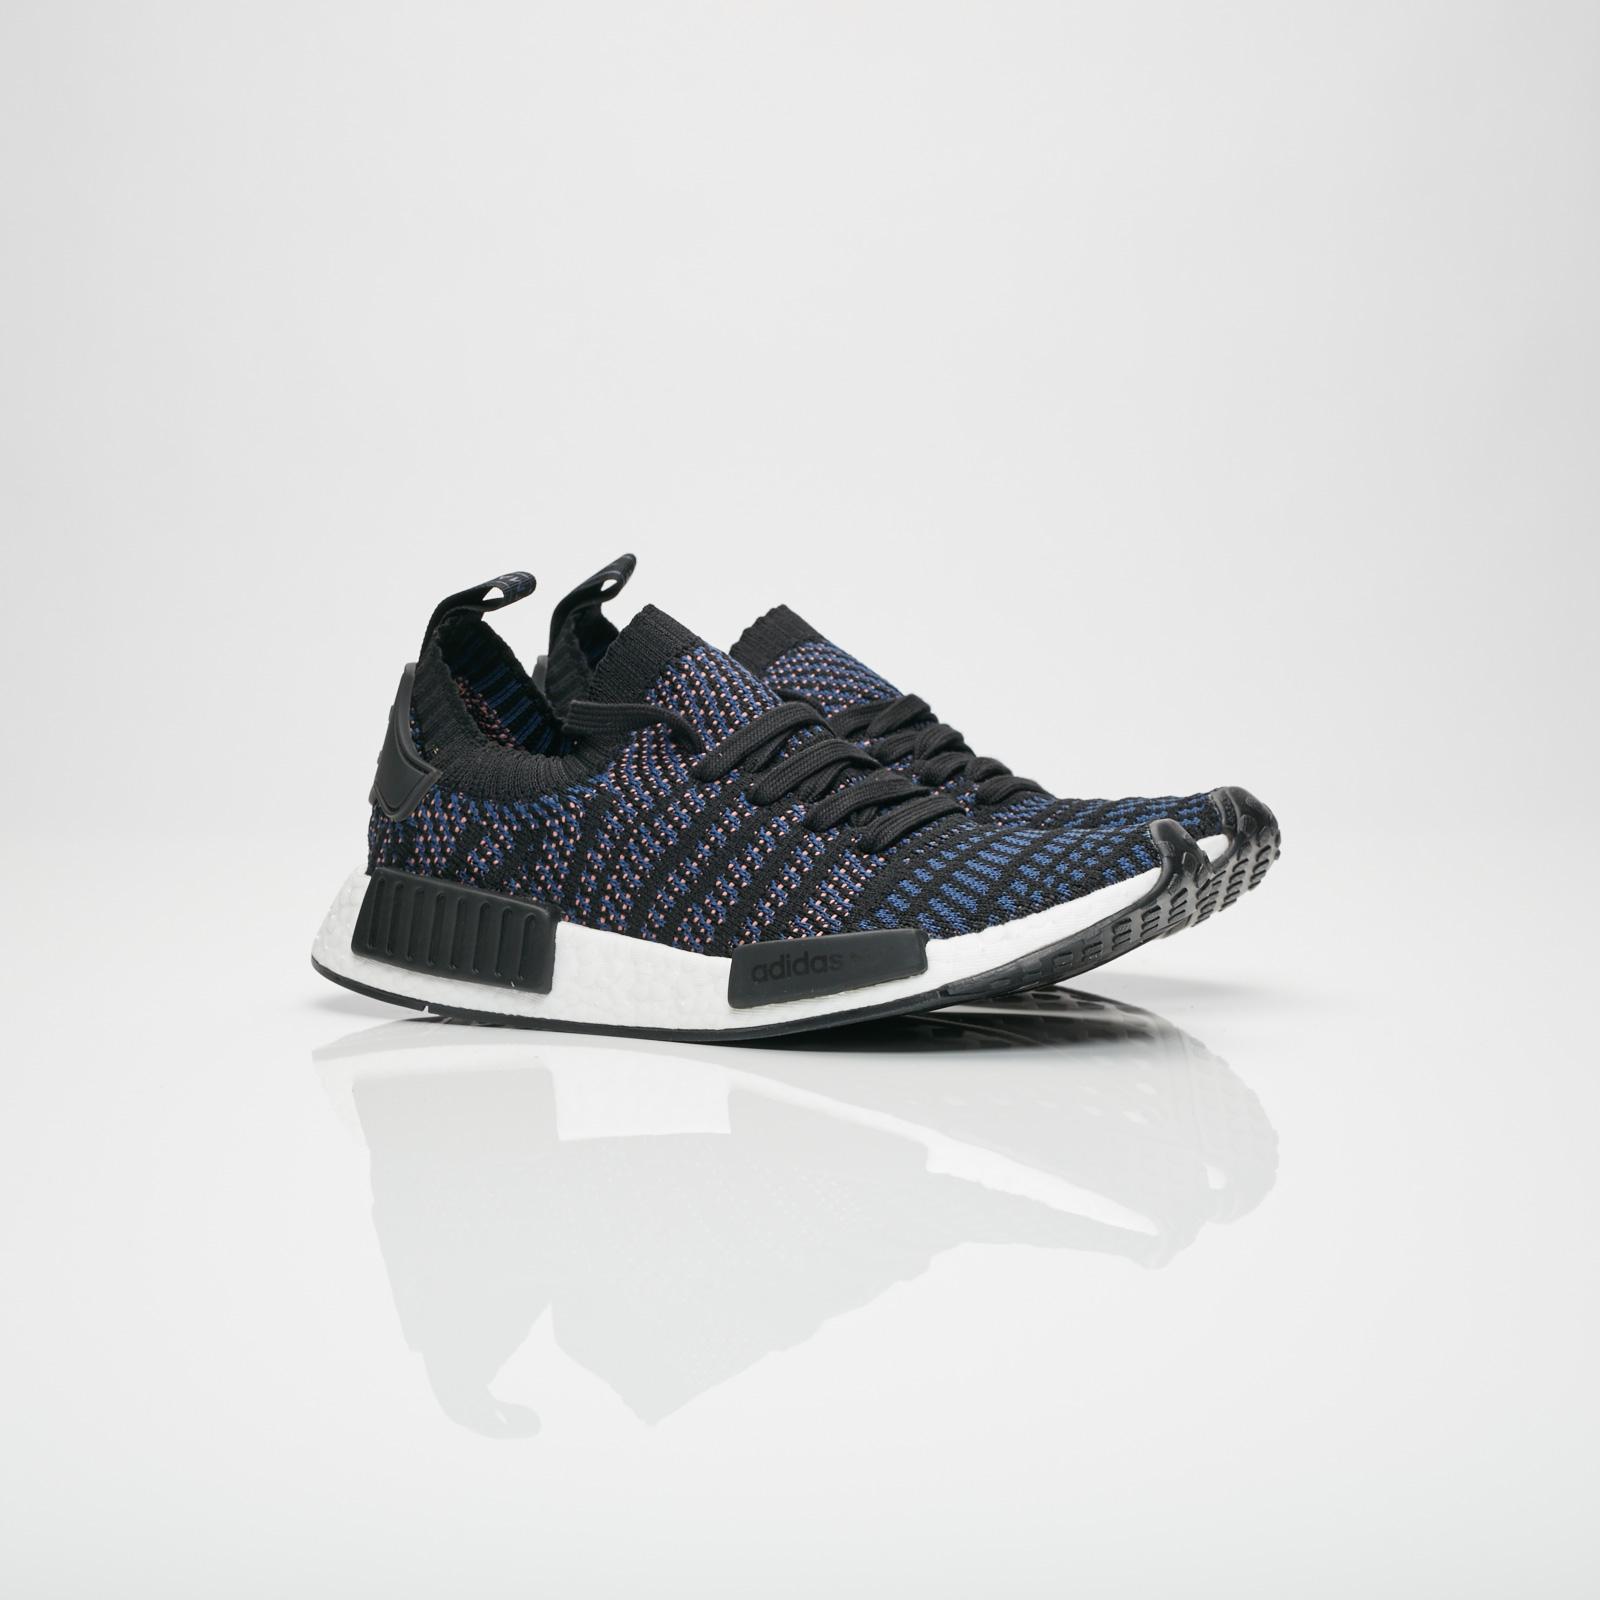 Sneakersnstuff Stlt Pk Ac8326 R1 Adidas Sneakers Nmd W 7ZxOEqw